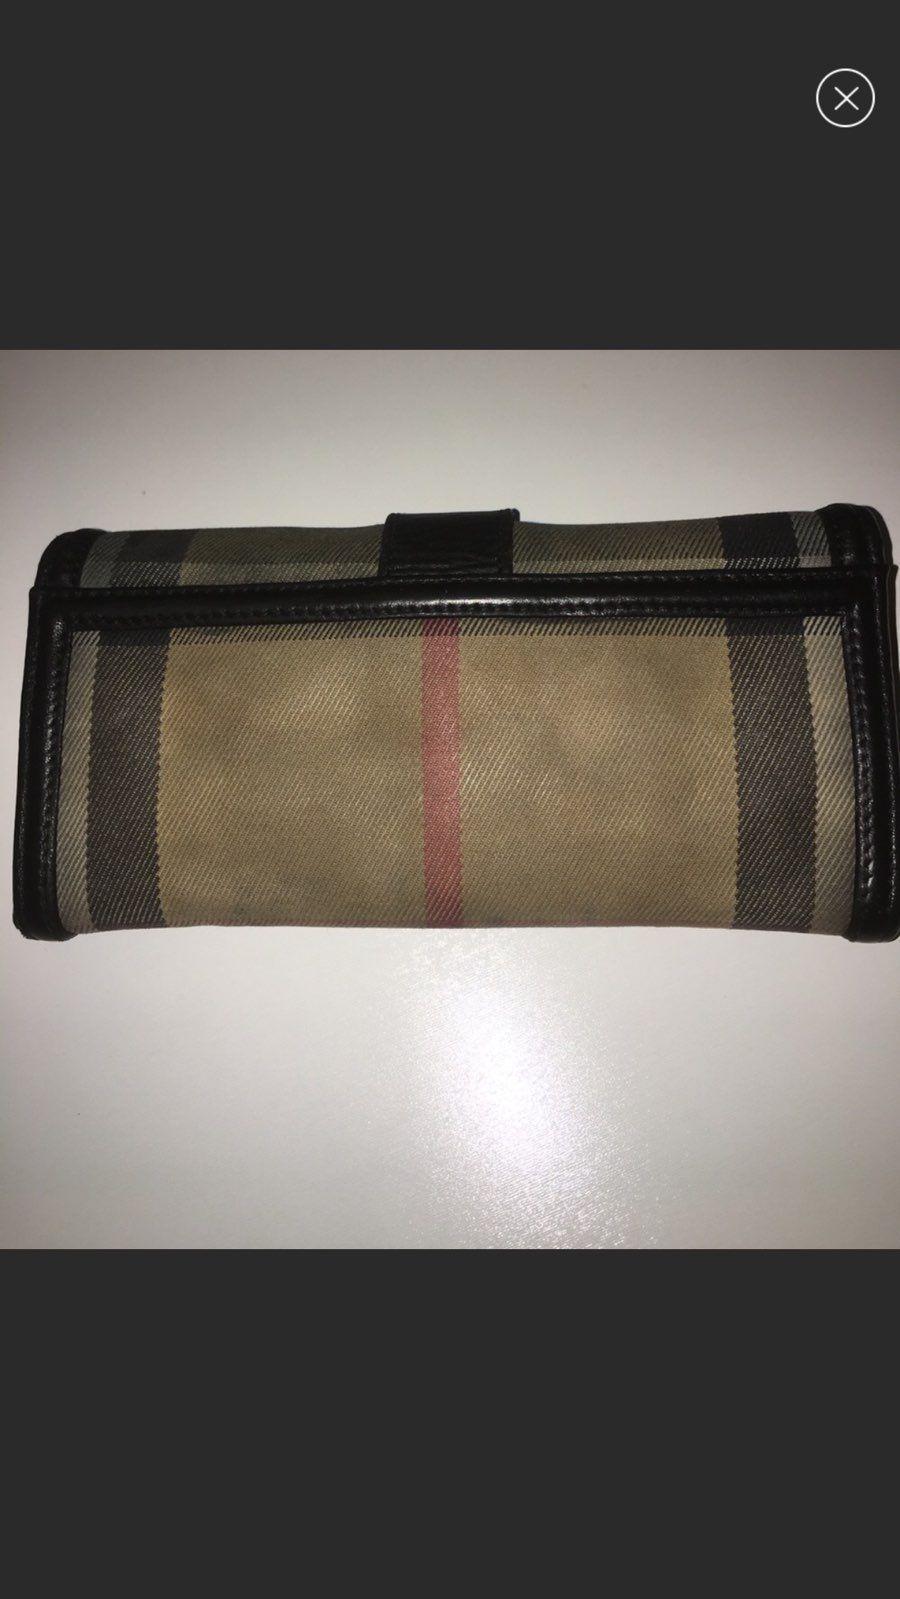 Burberry Envelope Wallet